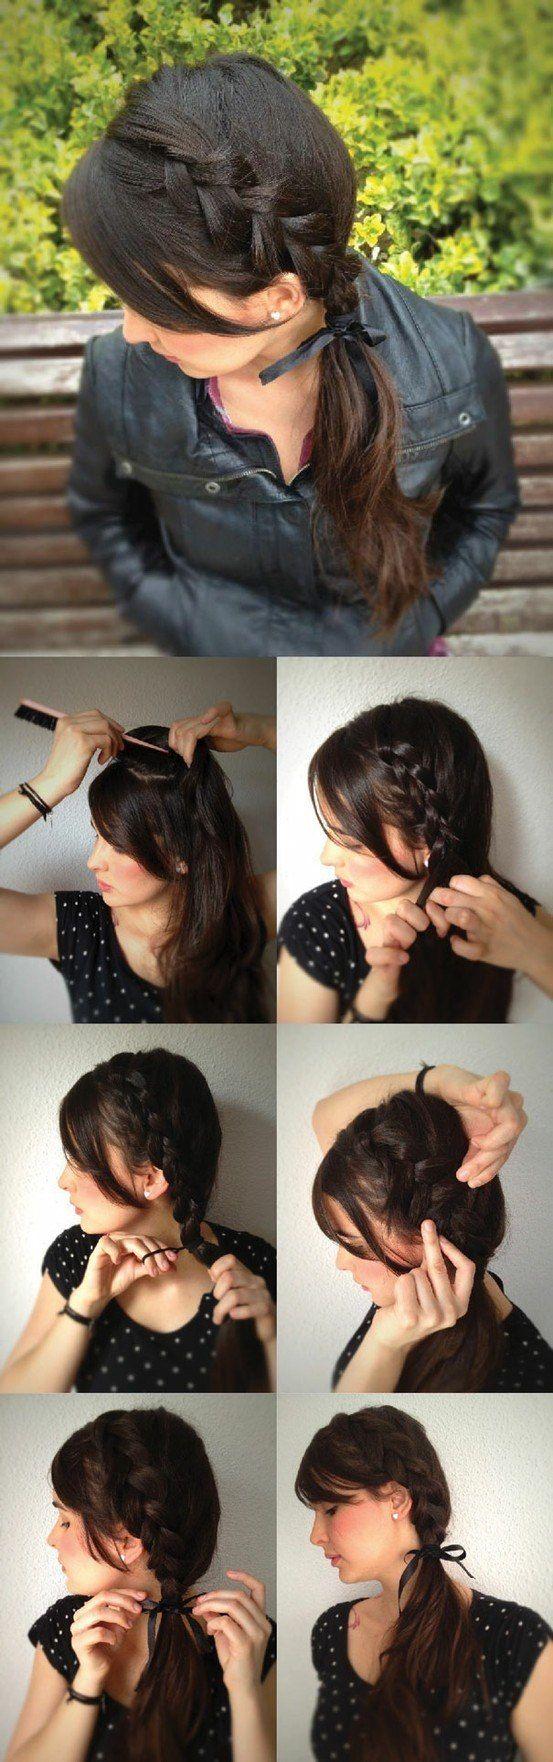 Love the braided ponytail